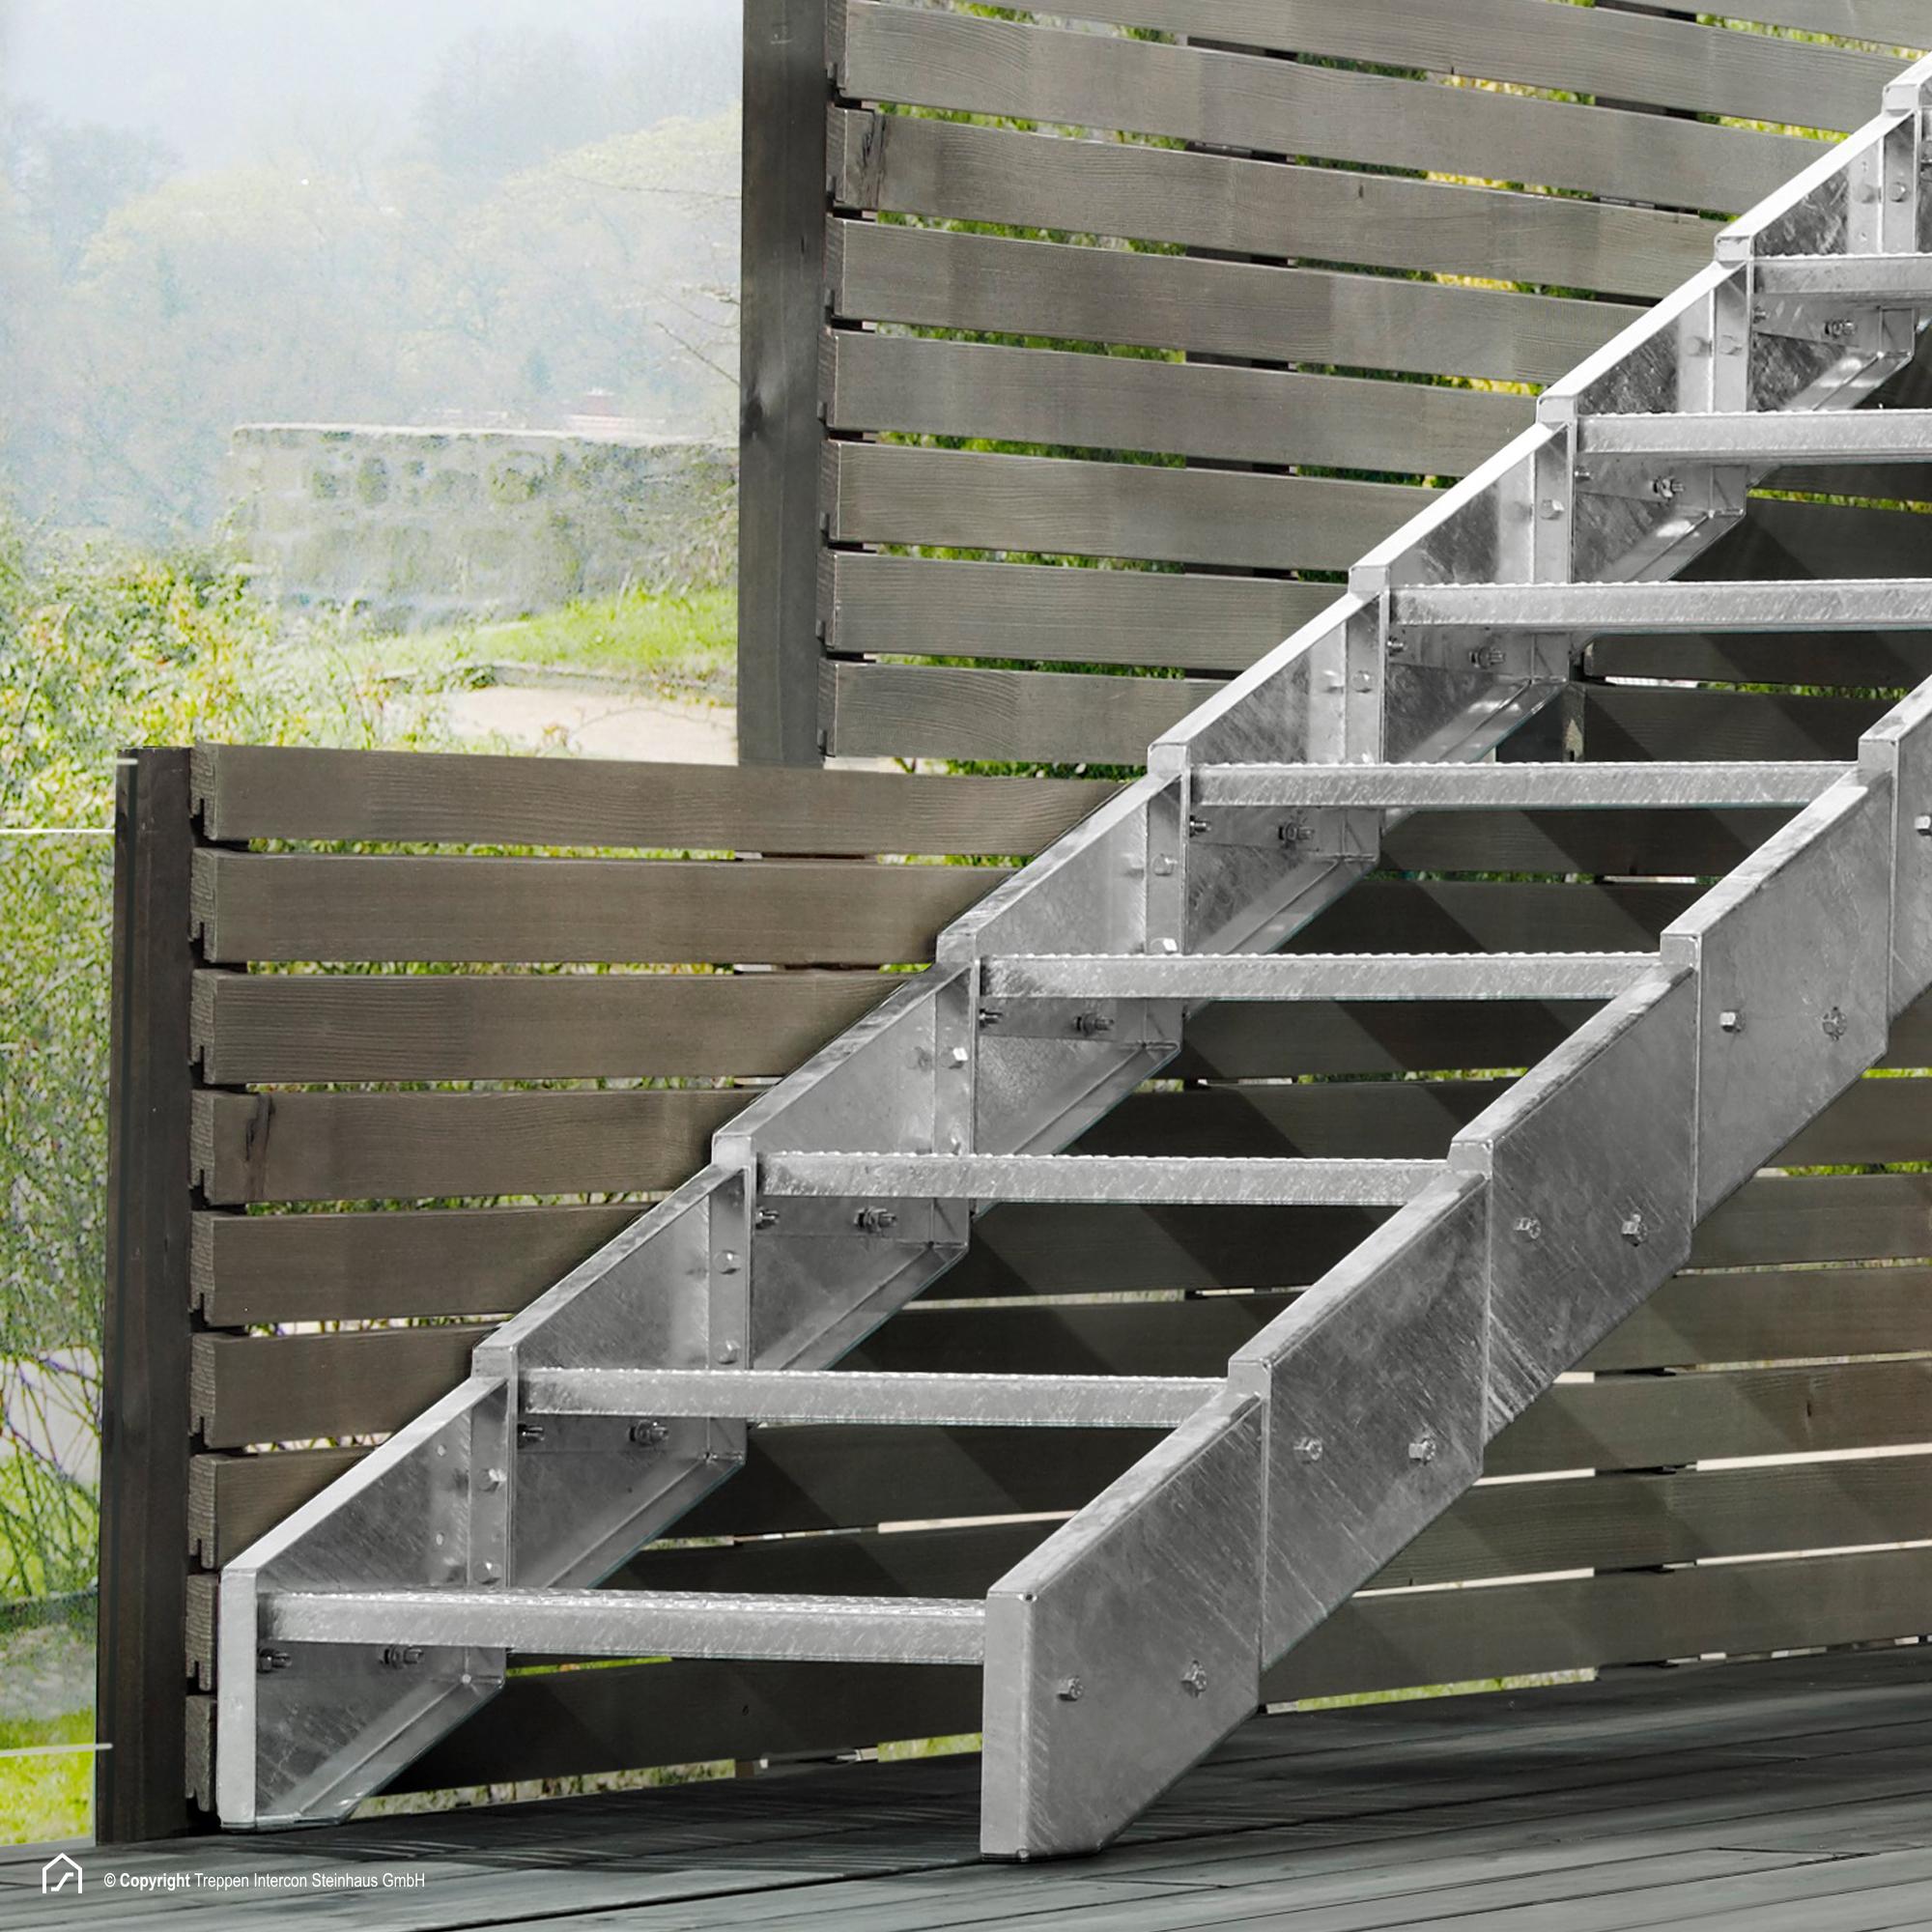 metalltreppe aus verzinktem stahl gesucht treppen intercon. Black Bedroom Furniture Sets. Home Design Ideas